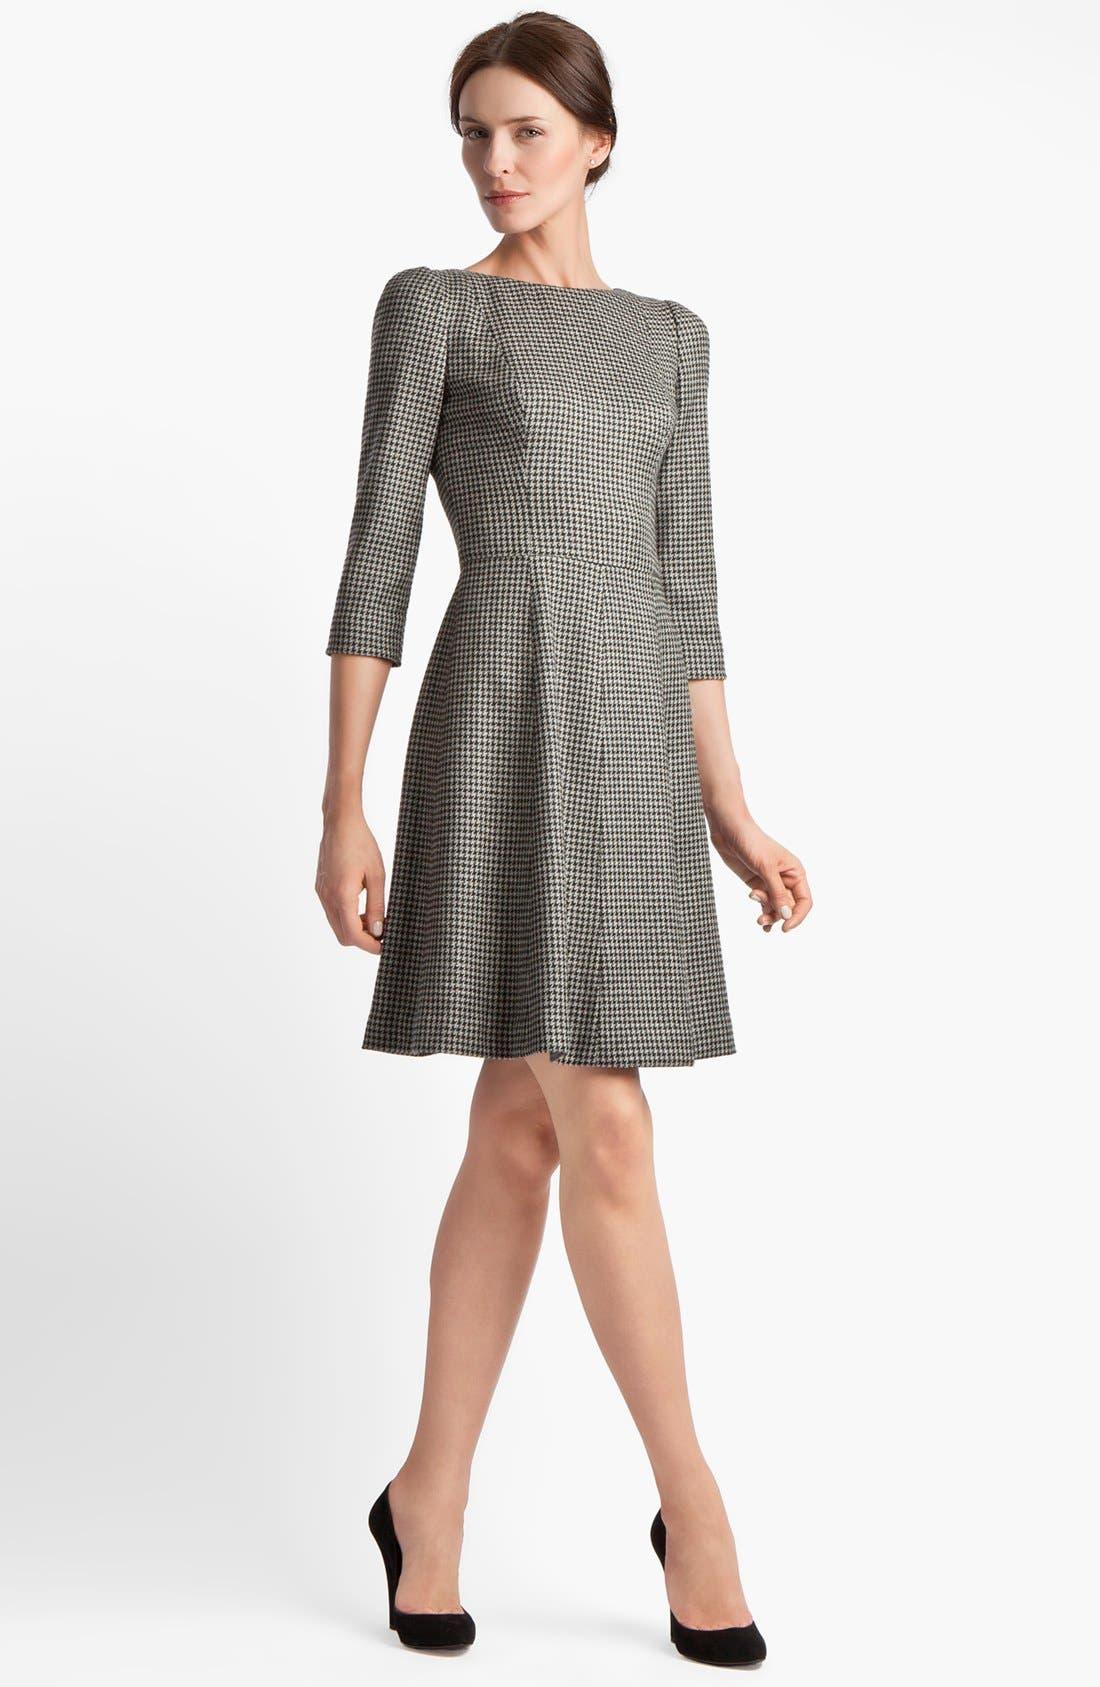 Main Image - Dolce&Gabbana Stretch Houndstooth Dress